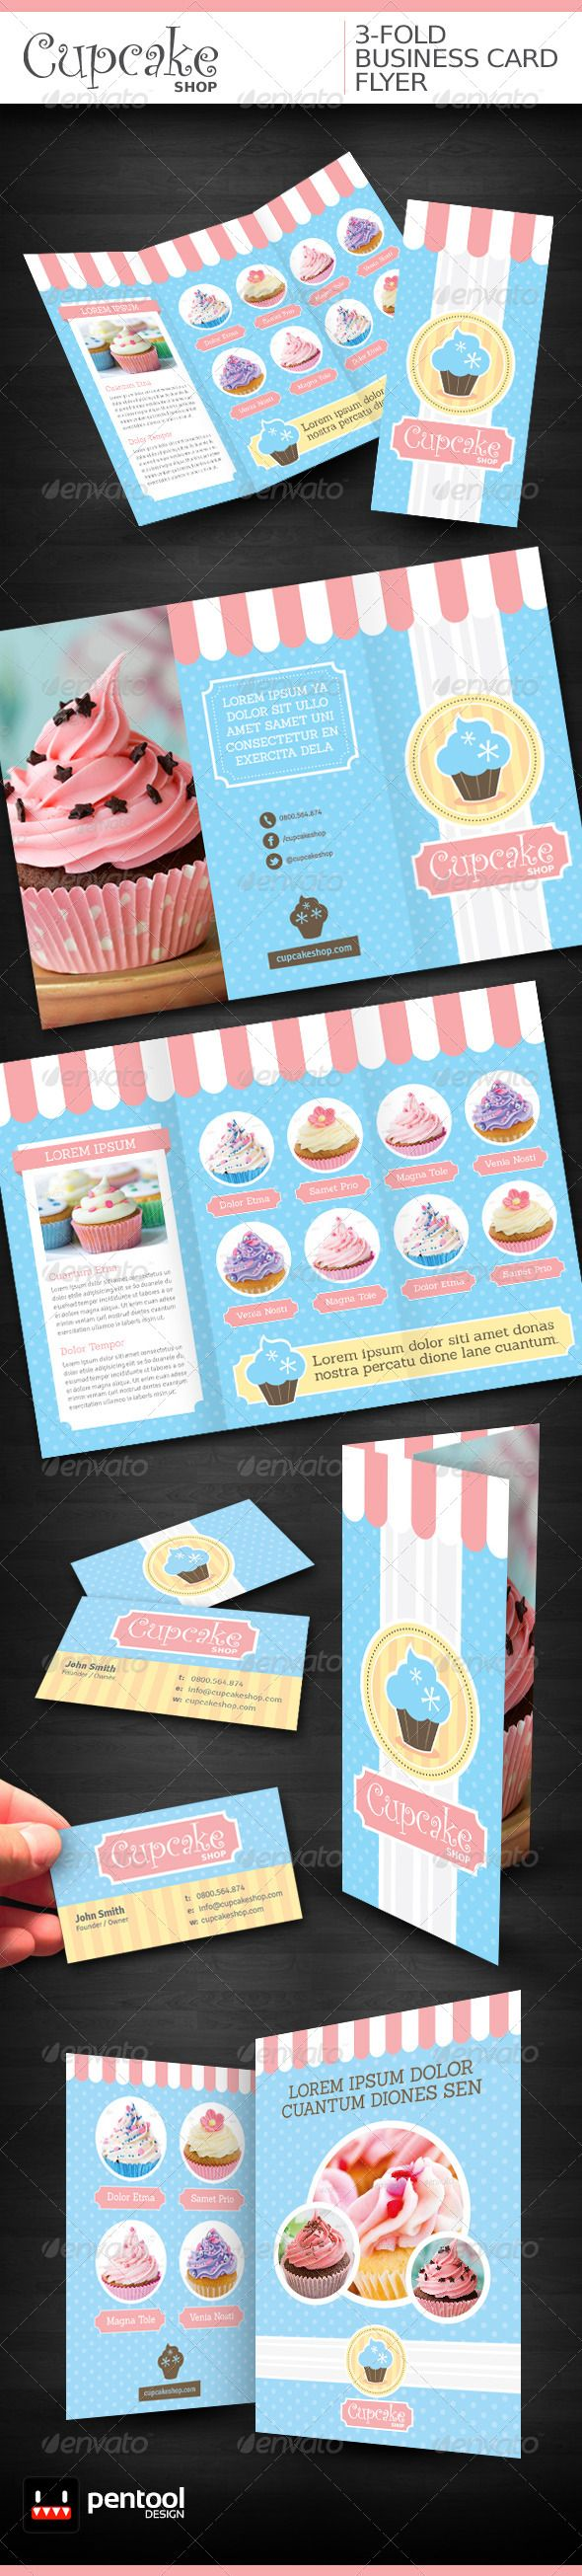 Cupcake Shop FoldBusiness CardFlyer Folded Business Cards - Cupcake business card template